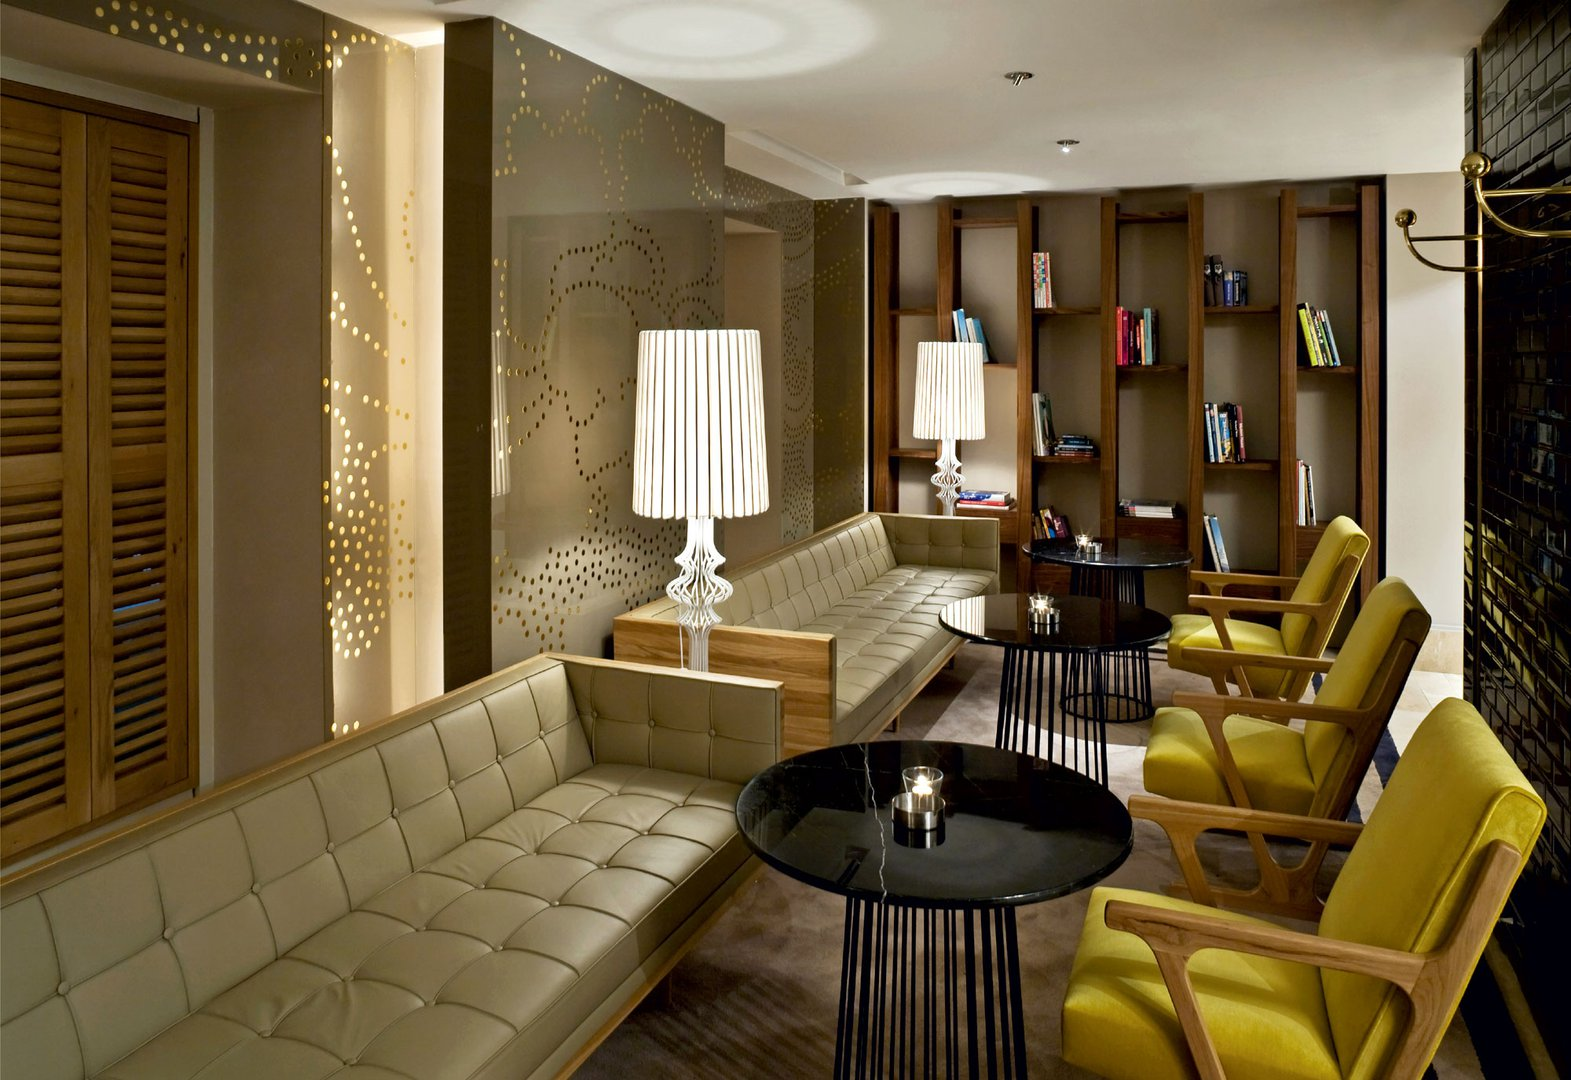 Hotel witt istanbul buti na oaza sredi velemesta dekor for Dekor hotel laleli istanbul